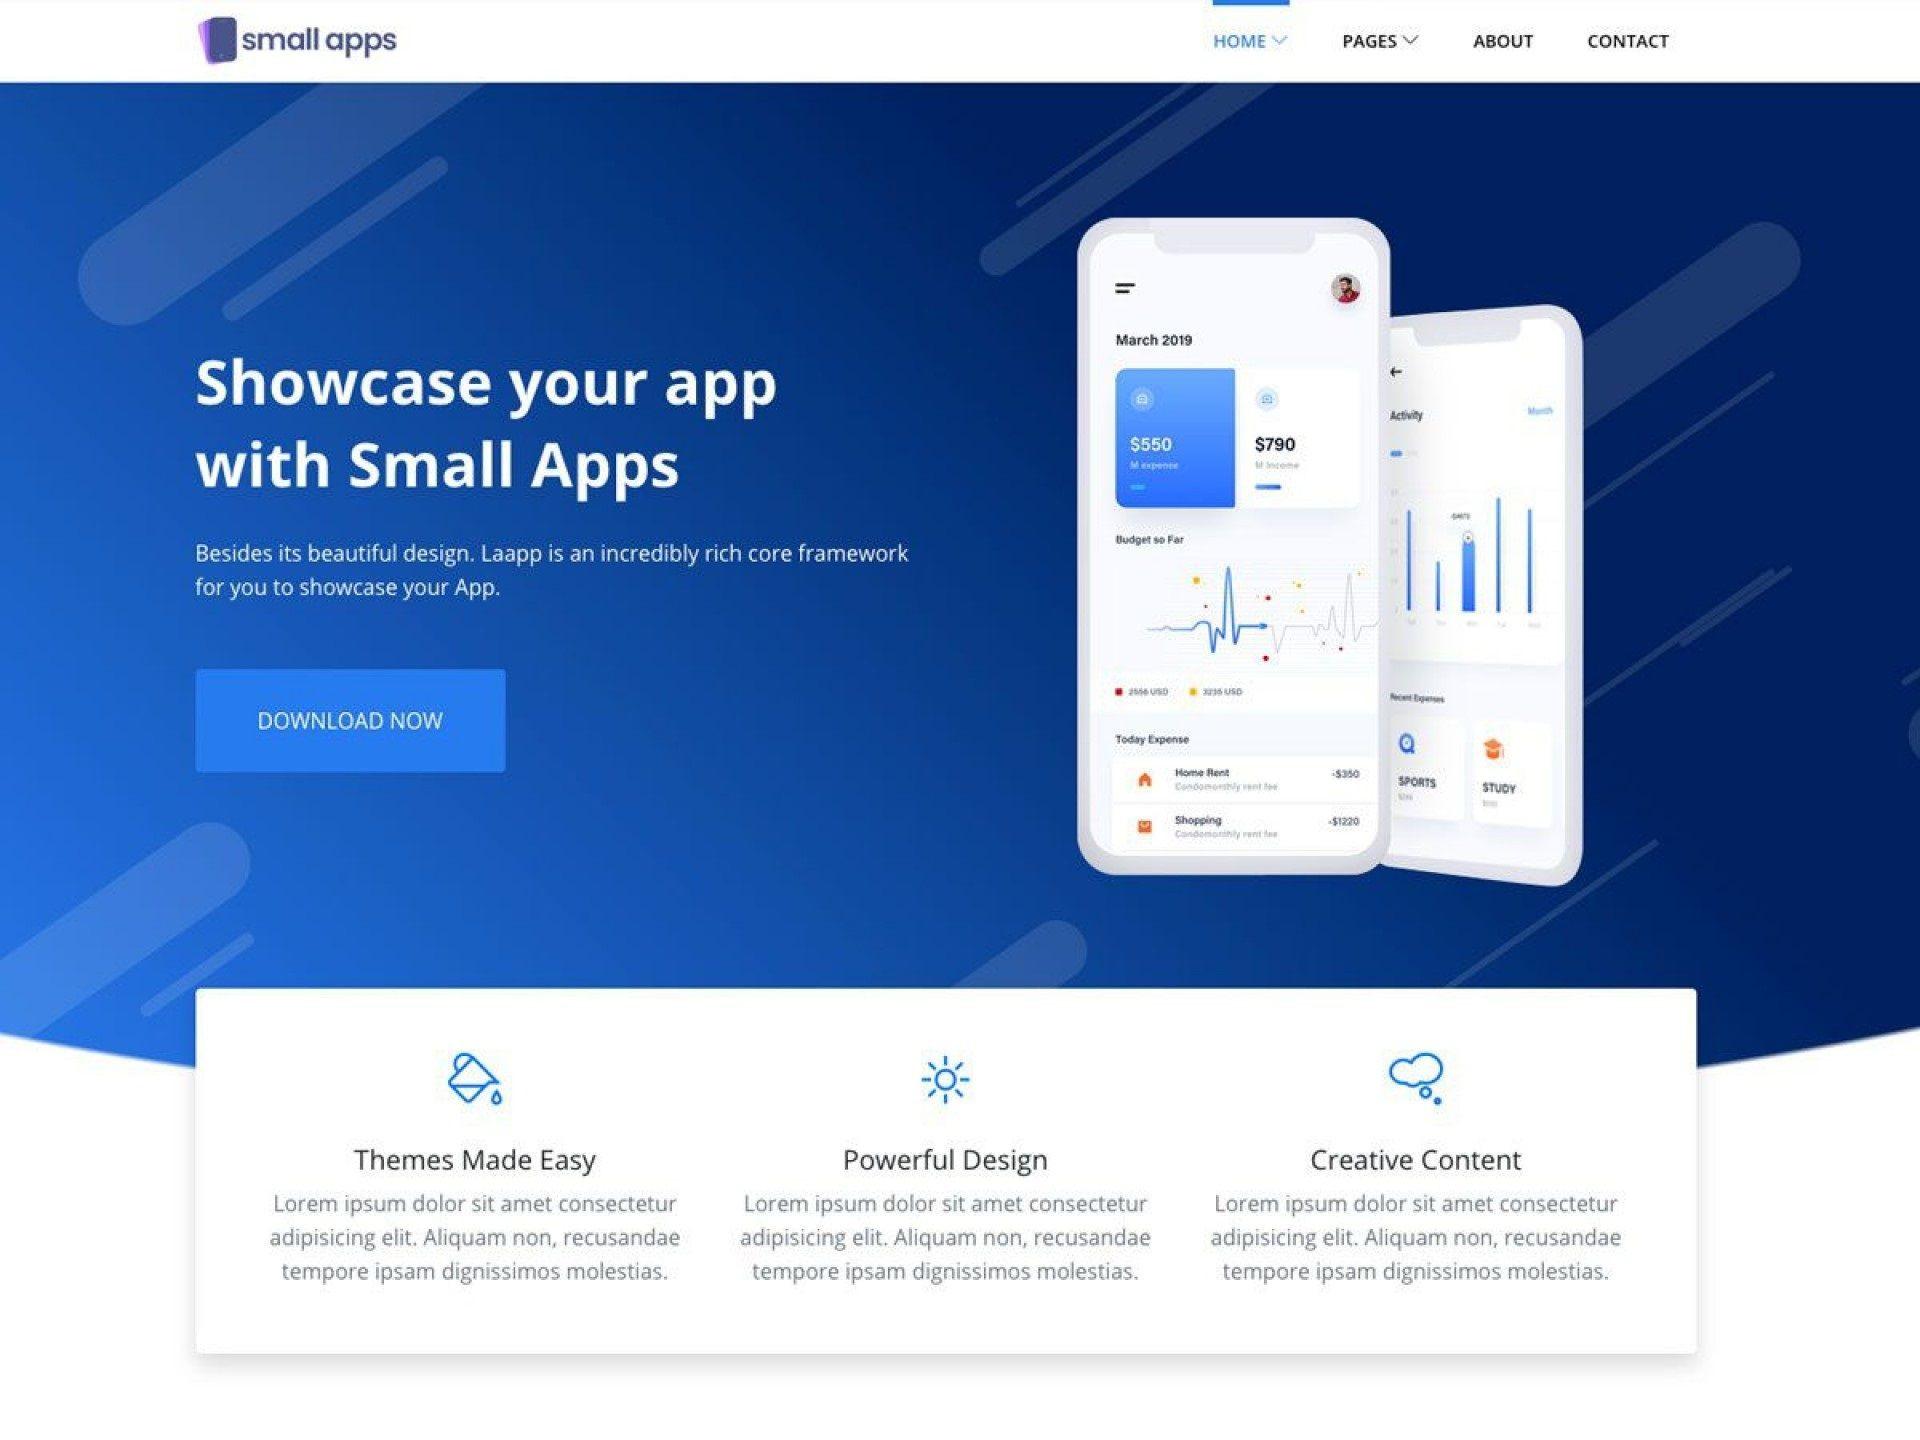 005 Rare Csvape Esponsive Mobile App Landing Page Html Template Free Download High Resolution  Csvape-responsive-mobile-app-landing-page-html-template1920